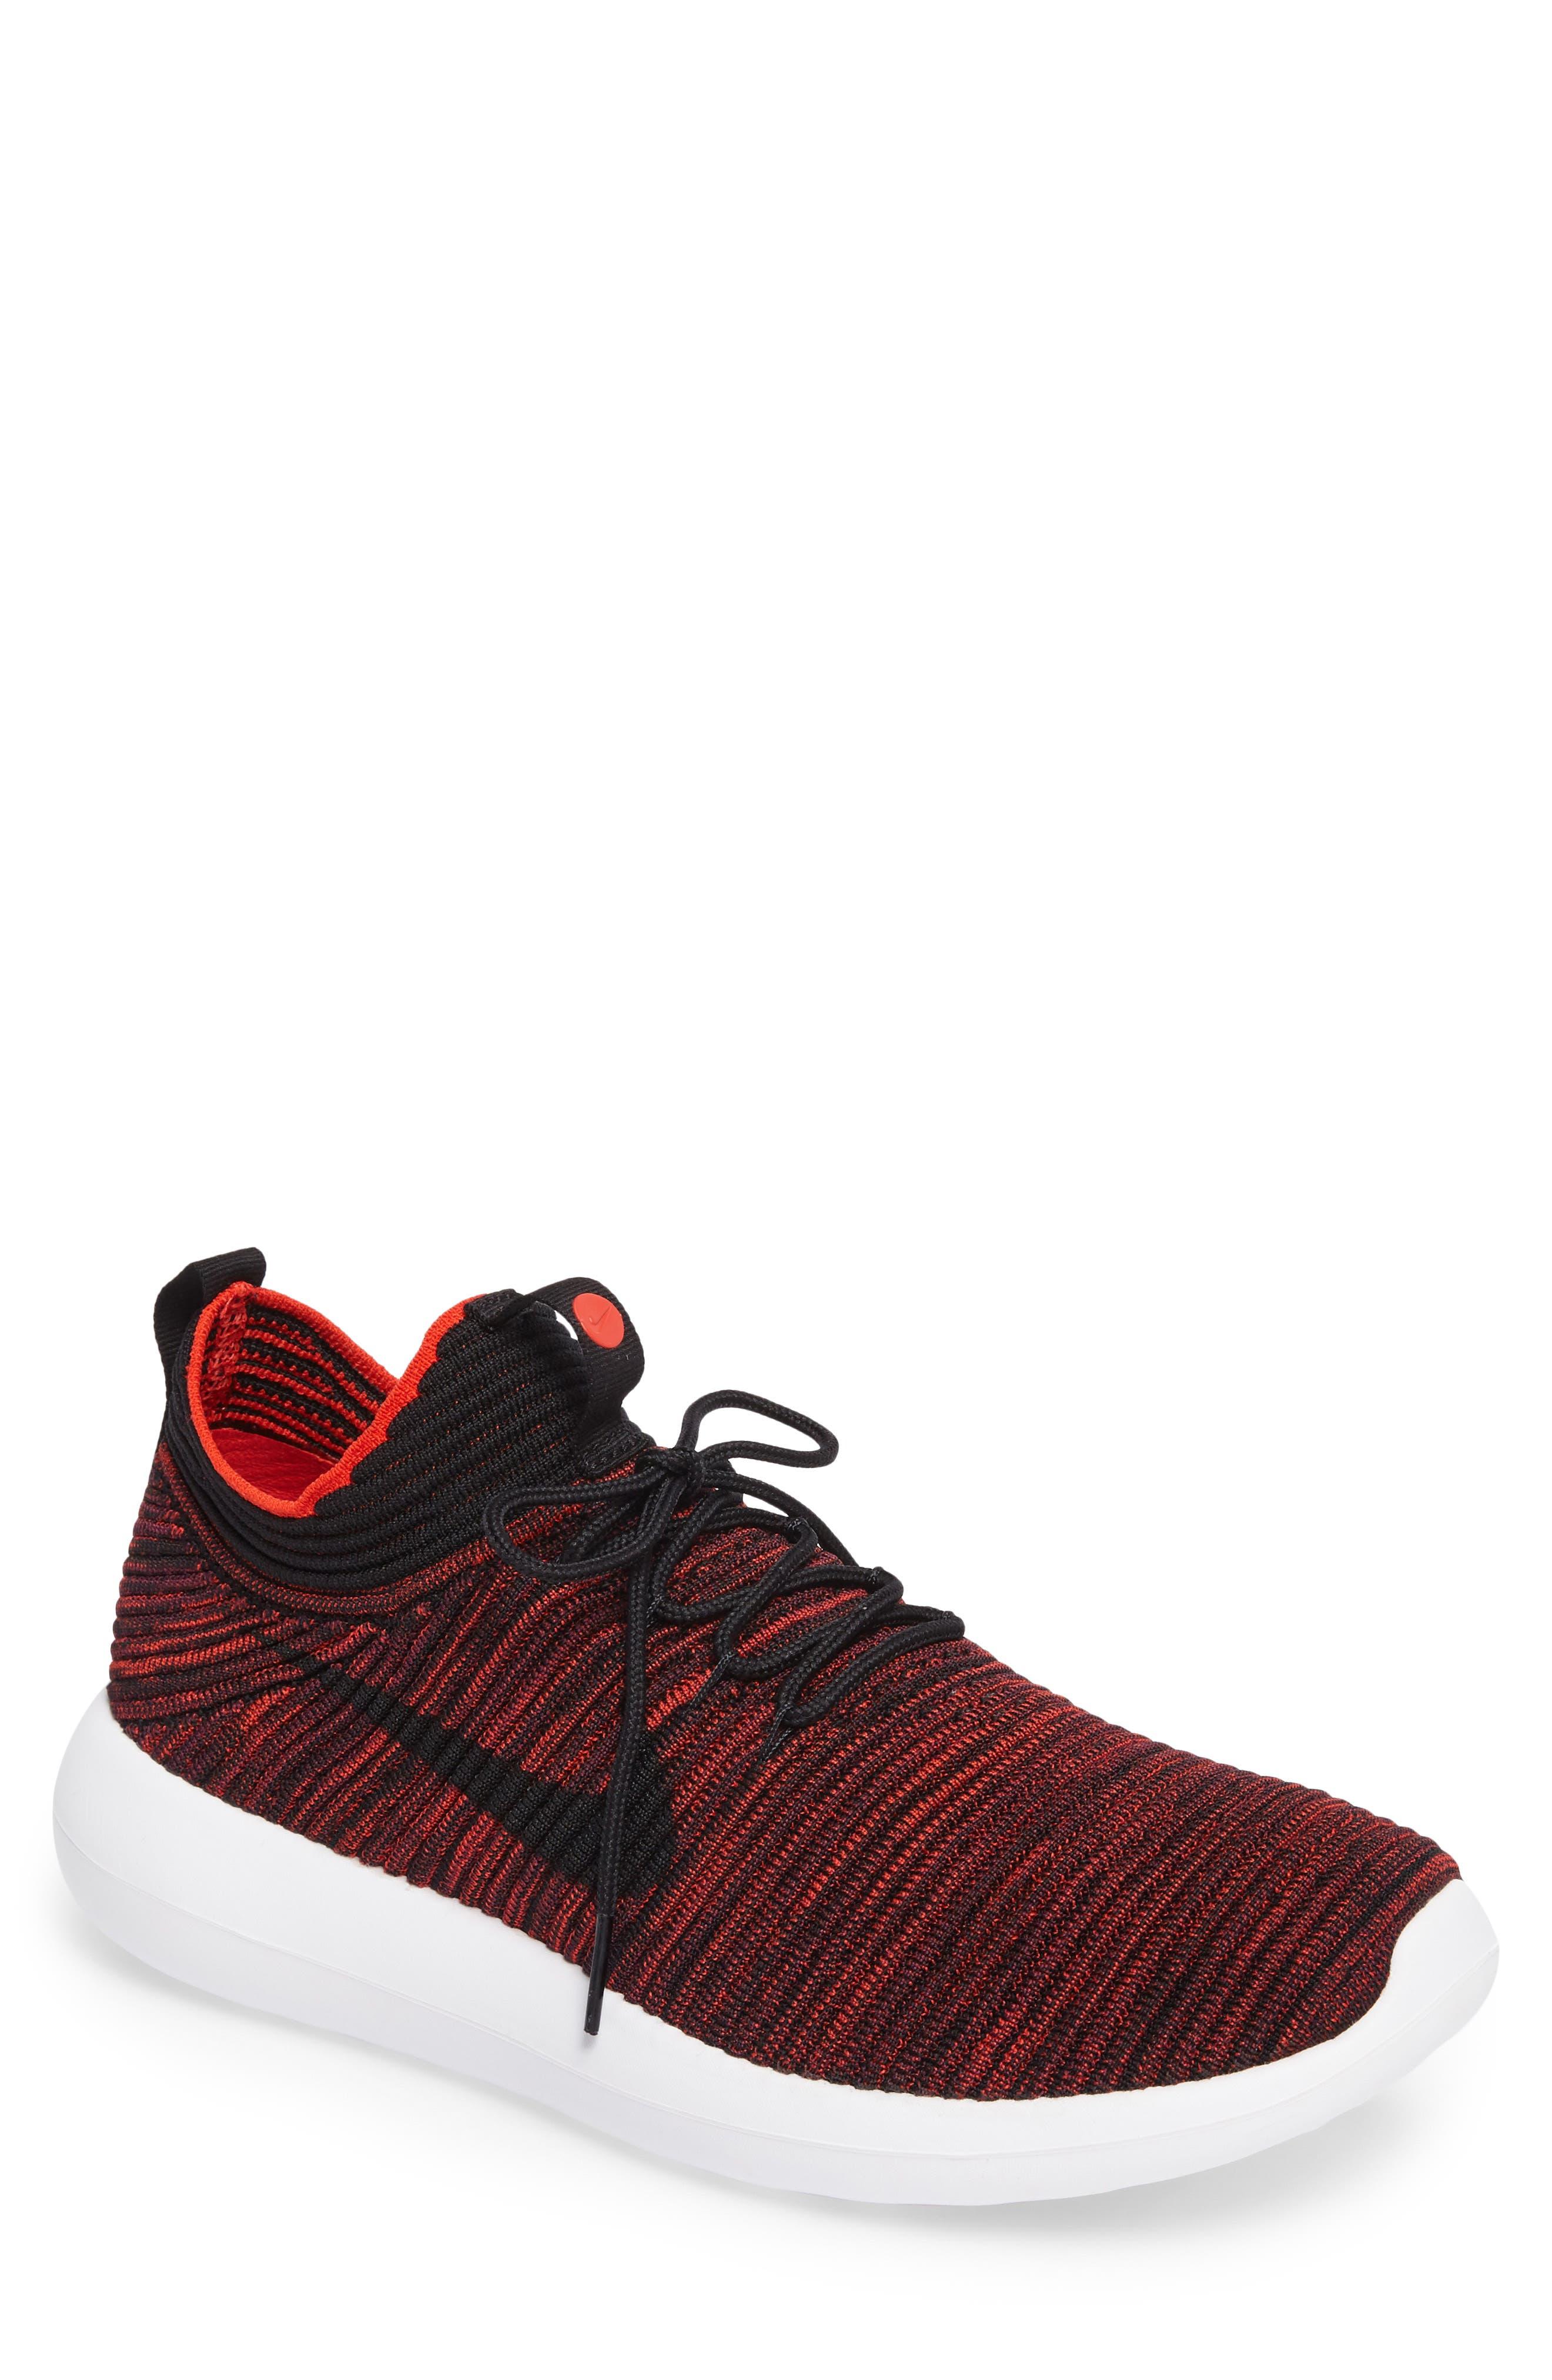 Roshe Two Flyknit V2 Sneaker,                         Main,                         color, Chile Red/ Black